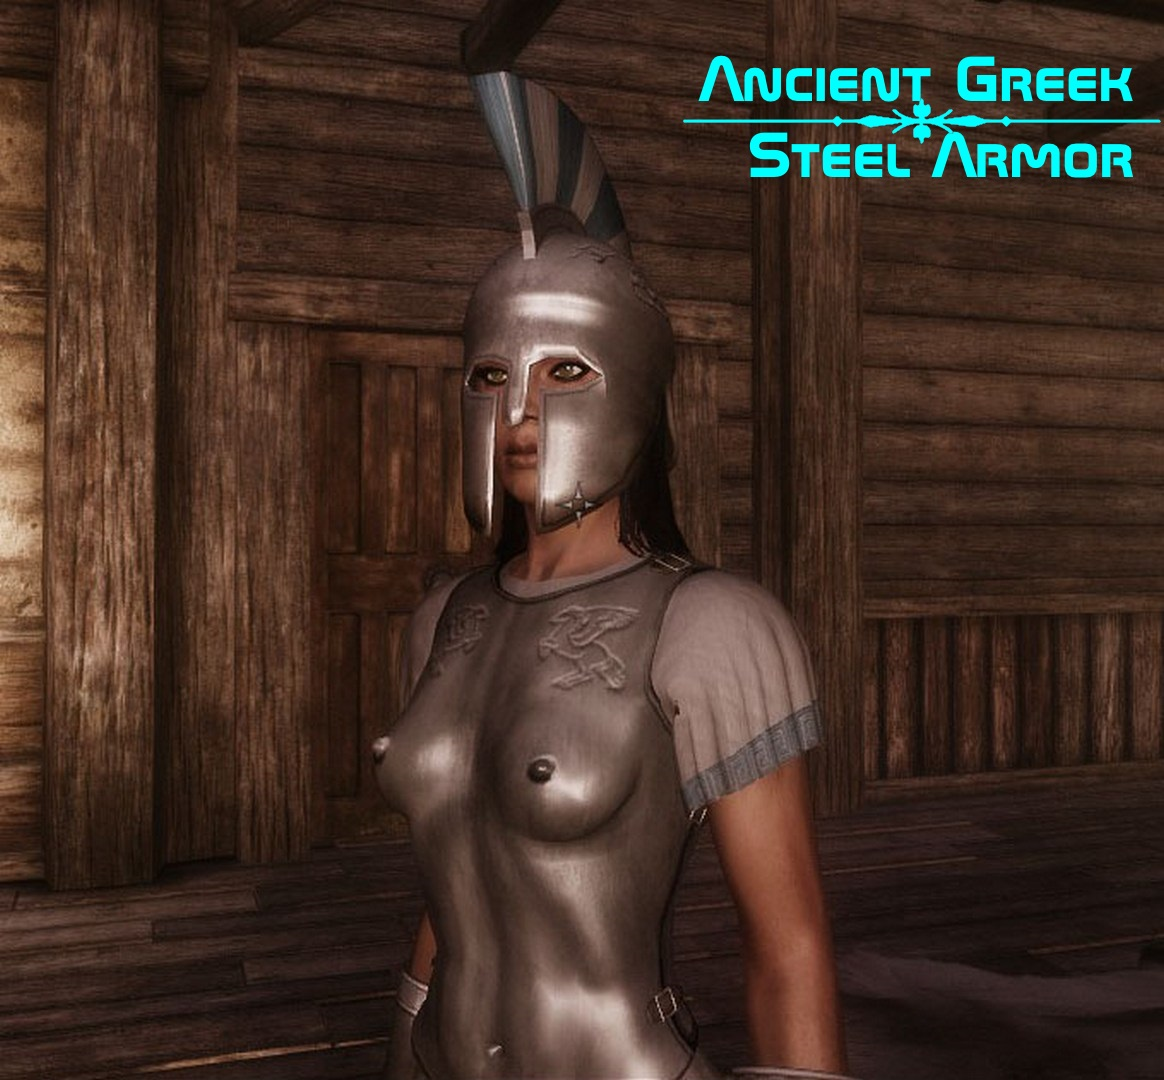 Ancient_Greek_Steel_Armor_00.jpg